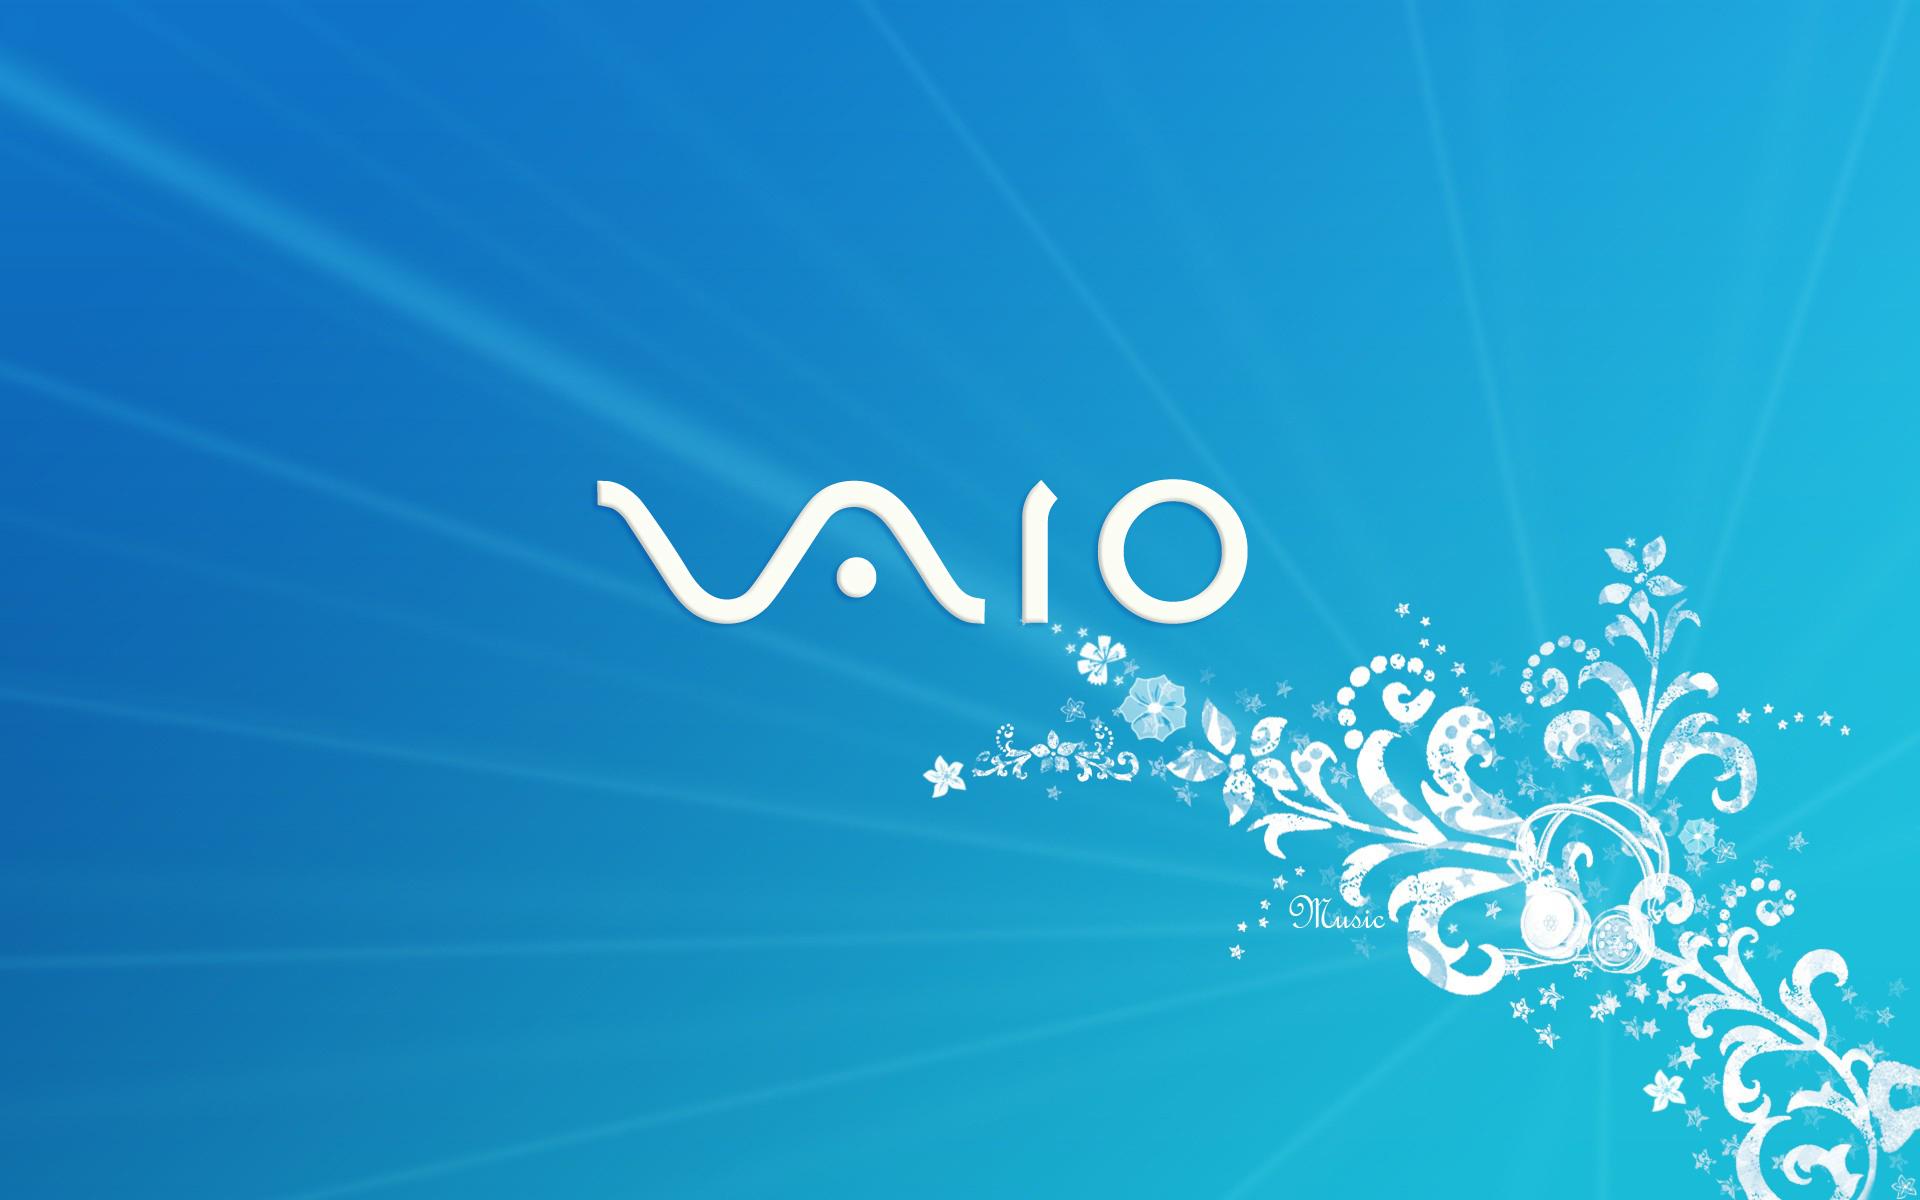 Sony Vaio Wallpaper